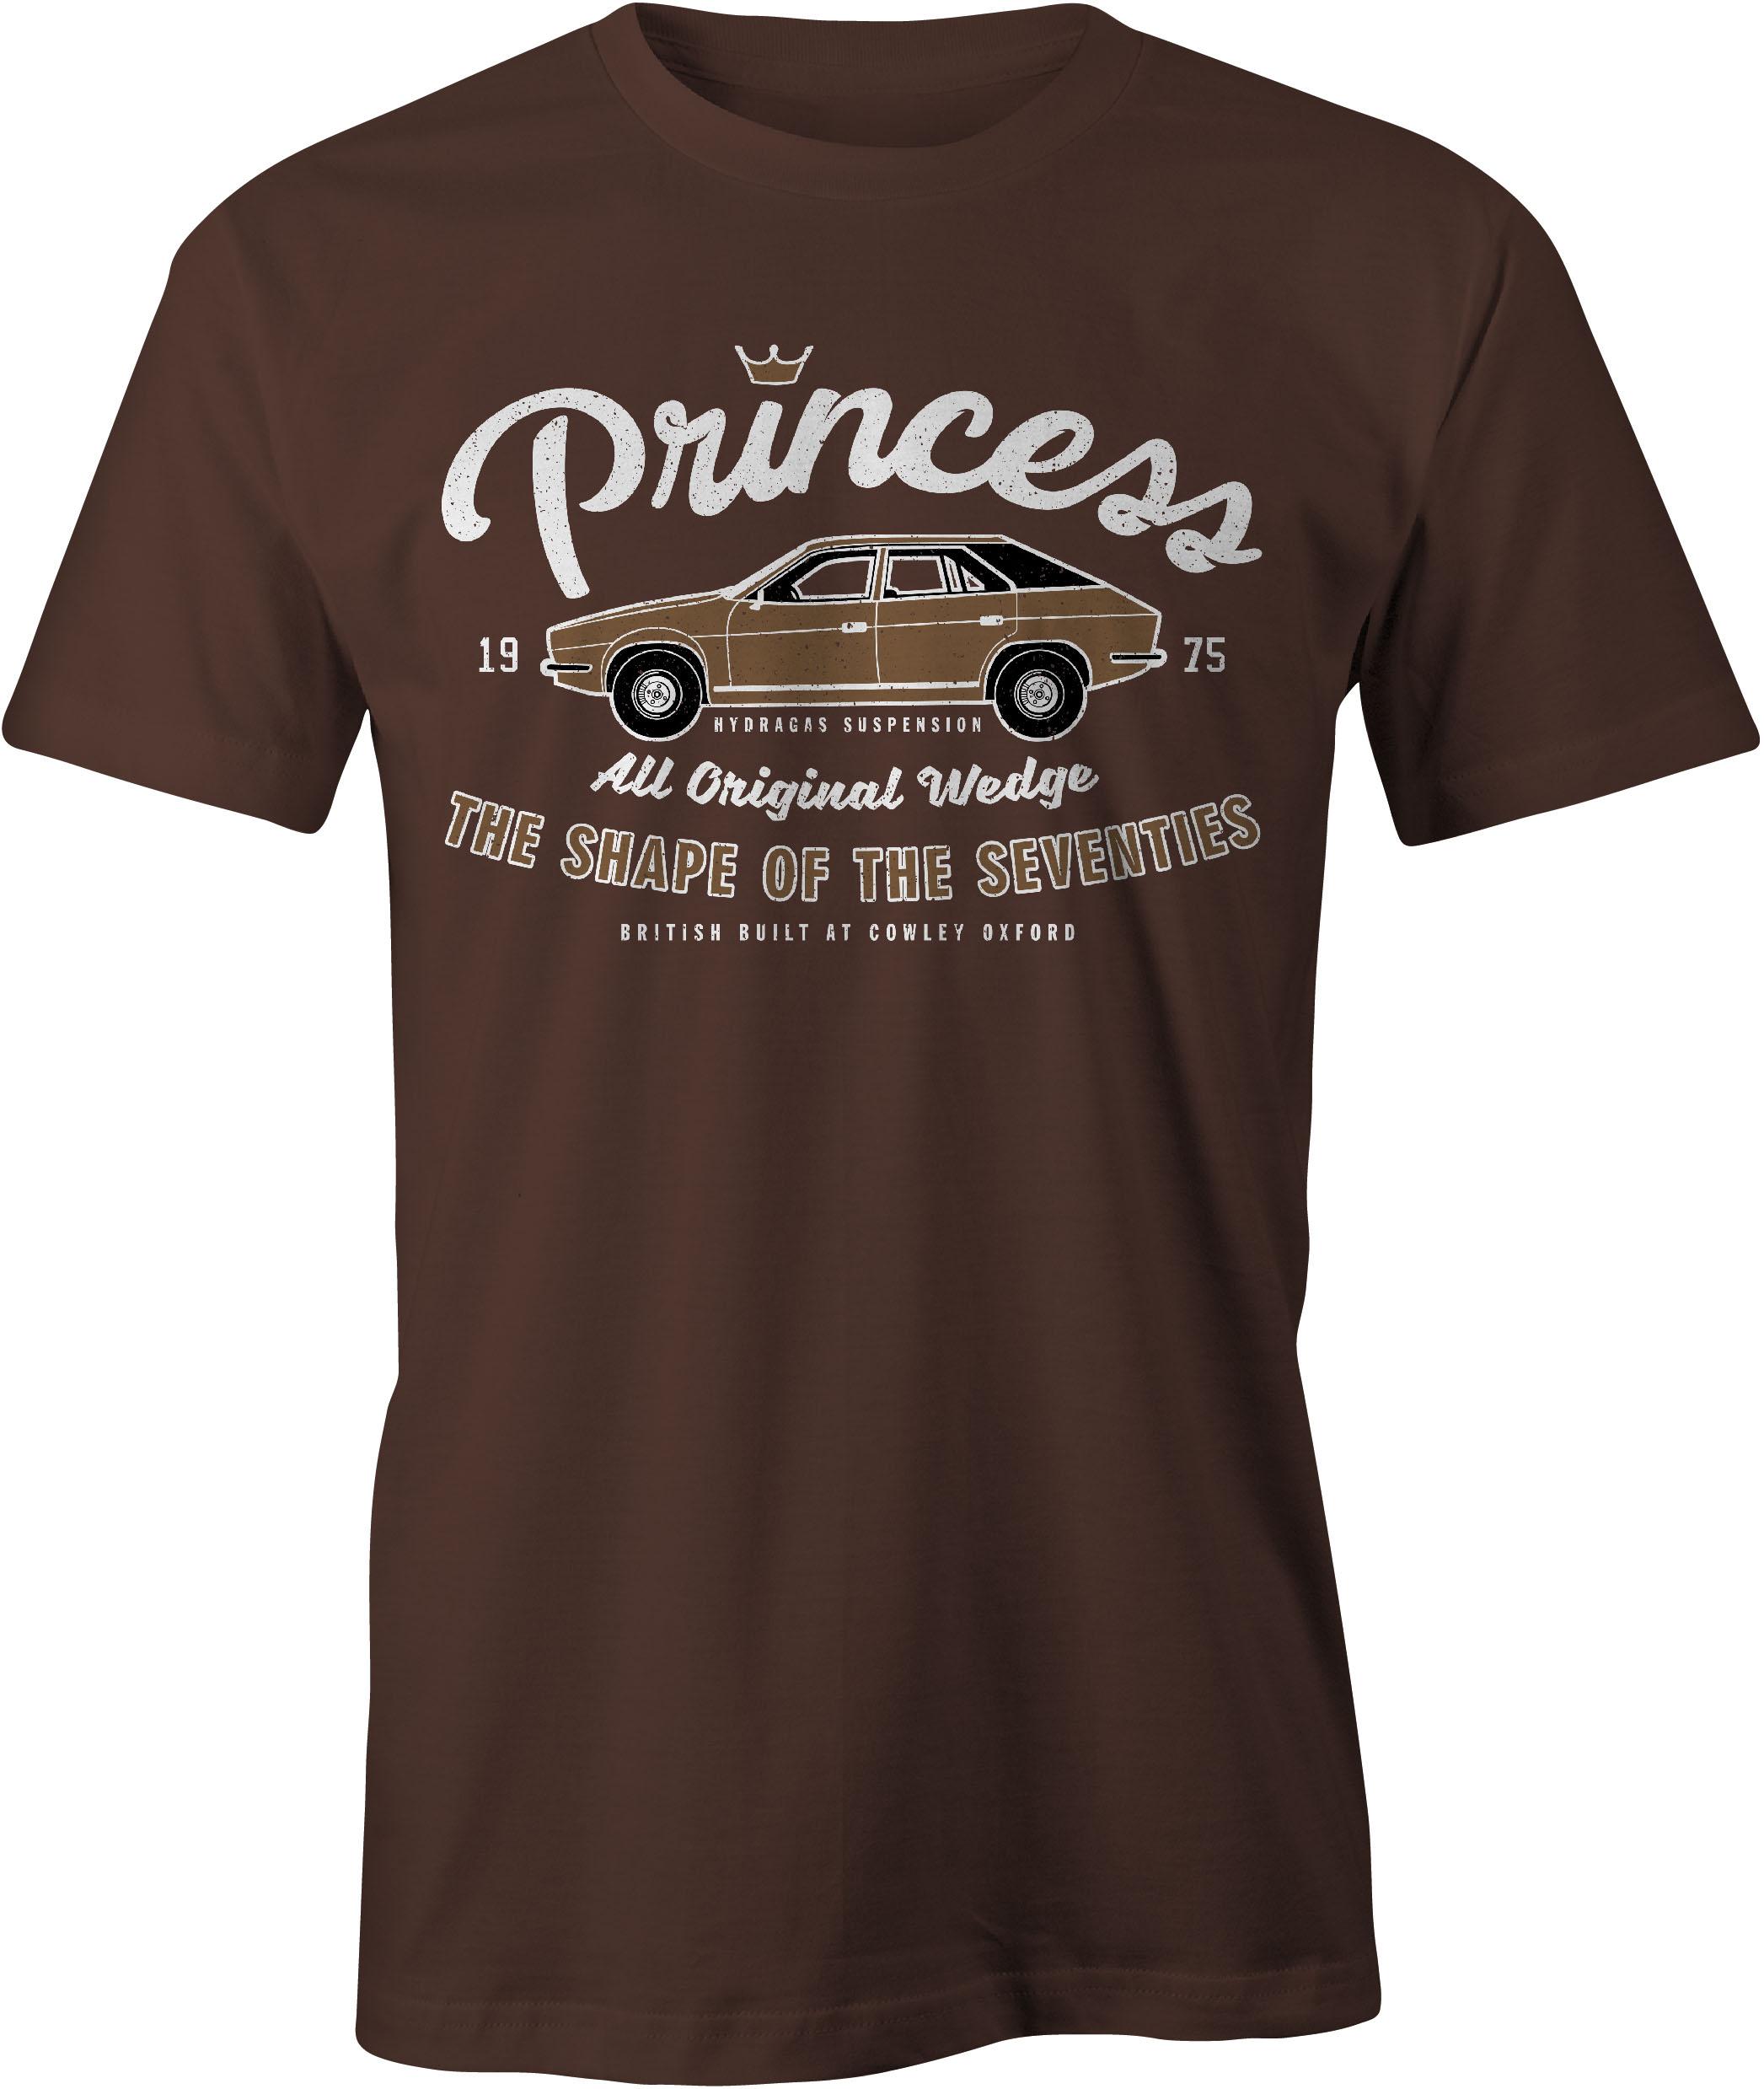 Princess T Shirt in Chocolate